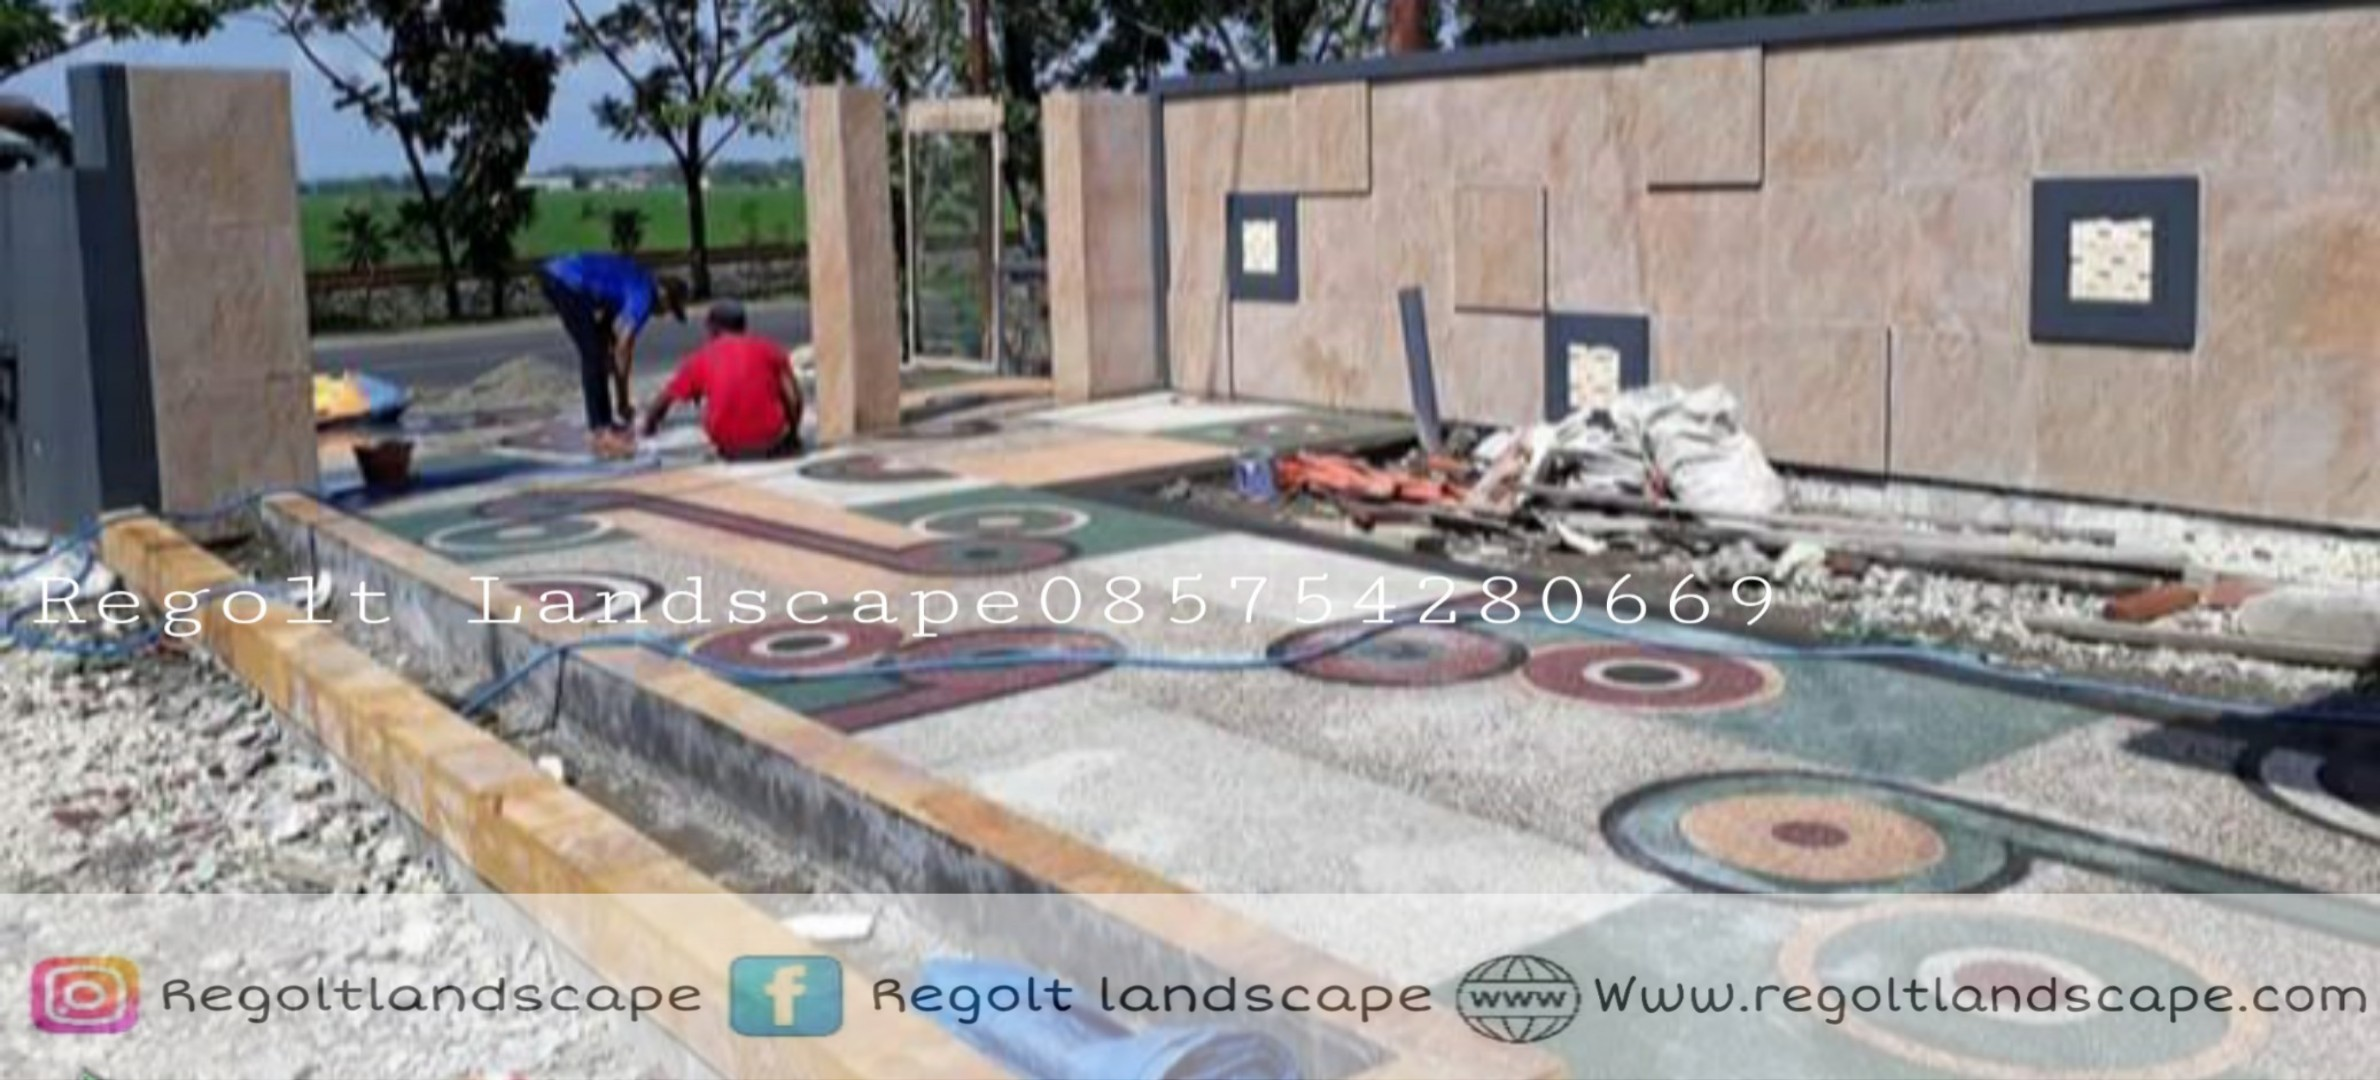 Jasa Pembuatan Batu Sikat Motif Karpet Di Jakarta